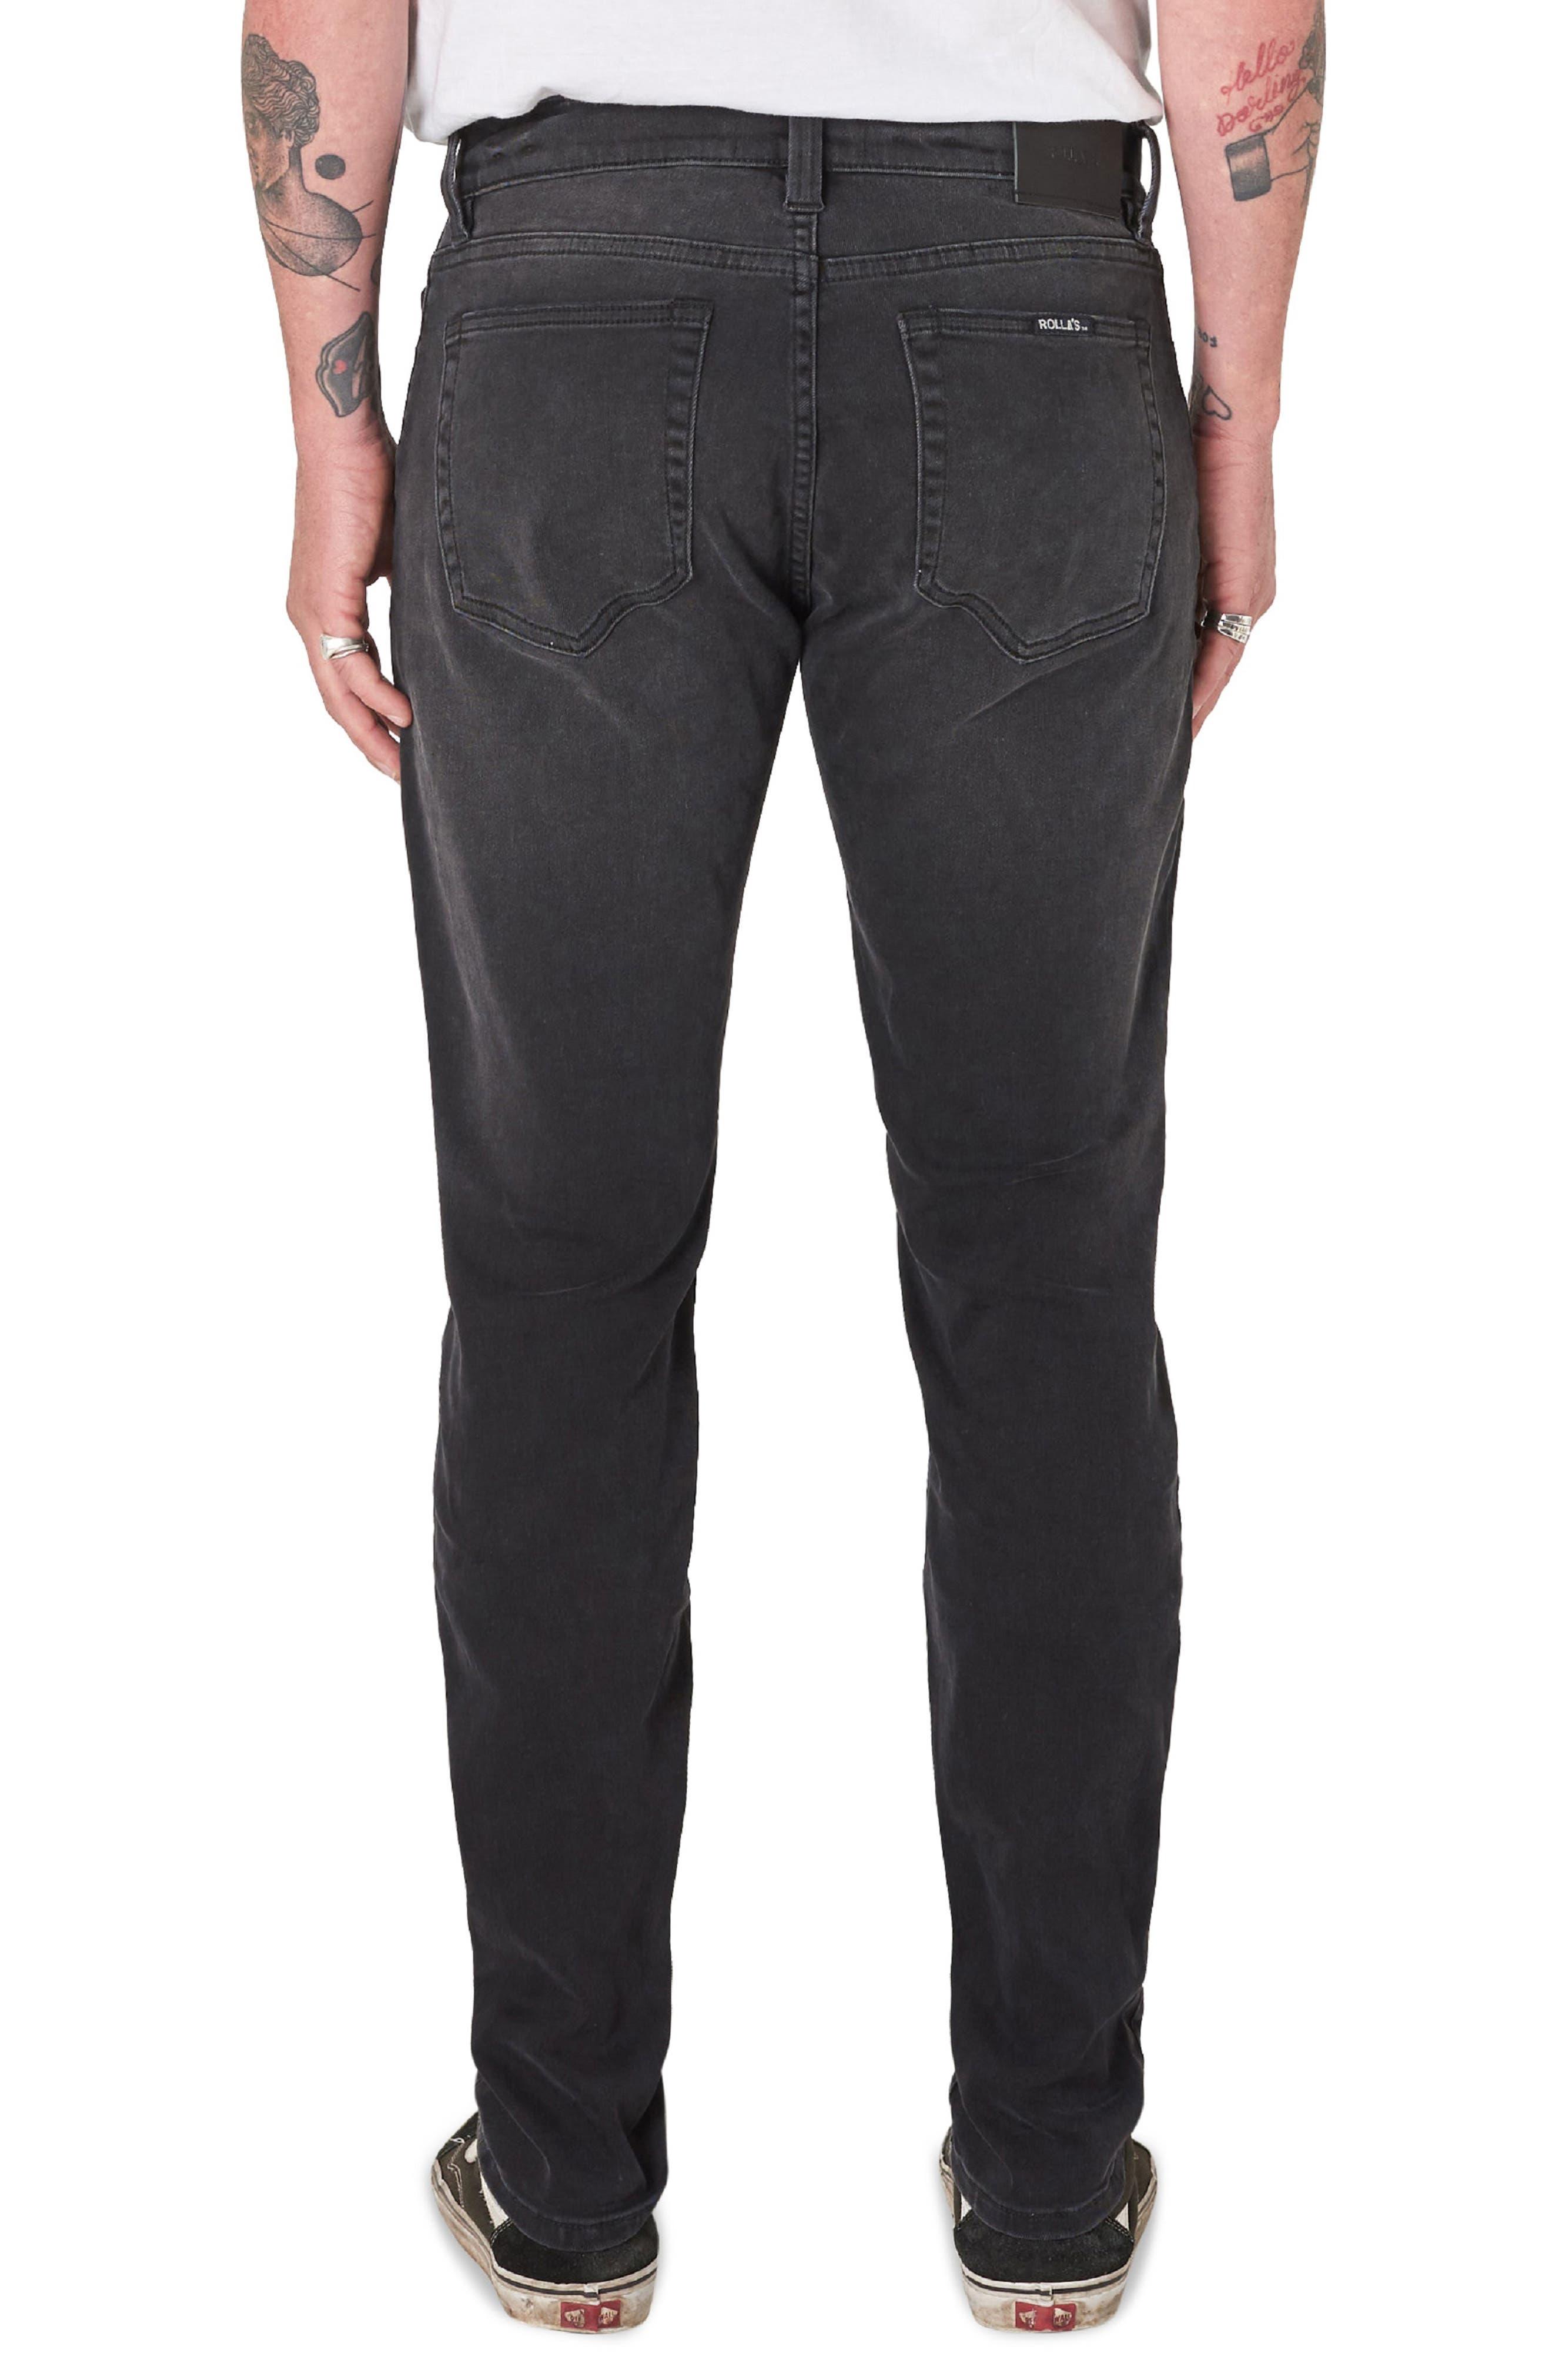 Stinger Skinny Fit Jeans,                             Alternate thumbnail 2, color,                             BLACK CAT